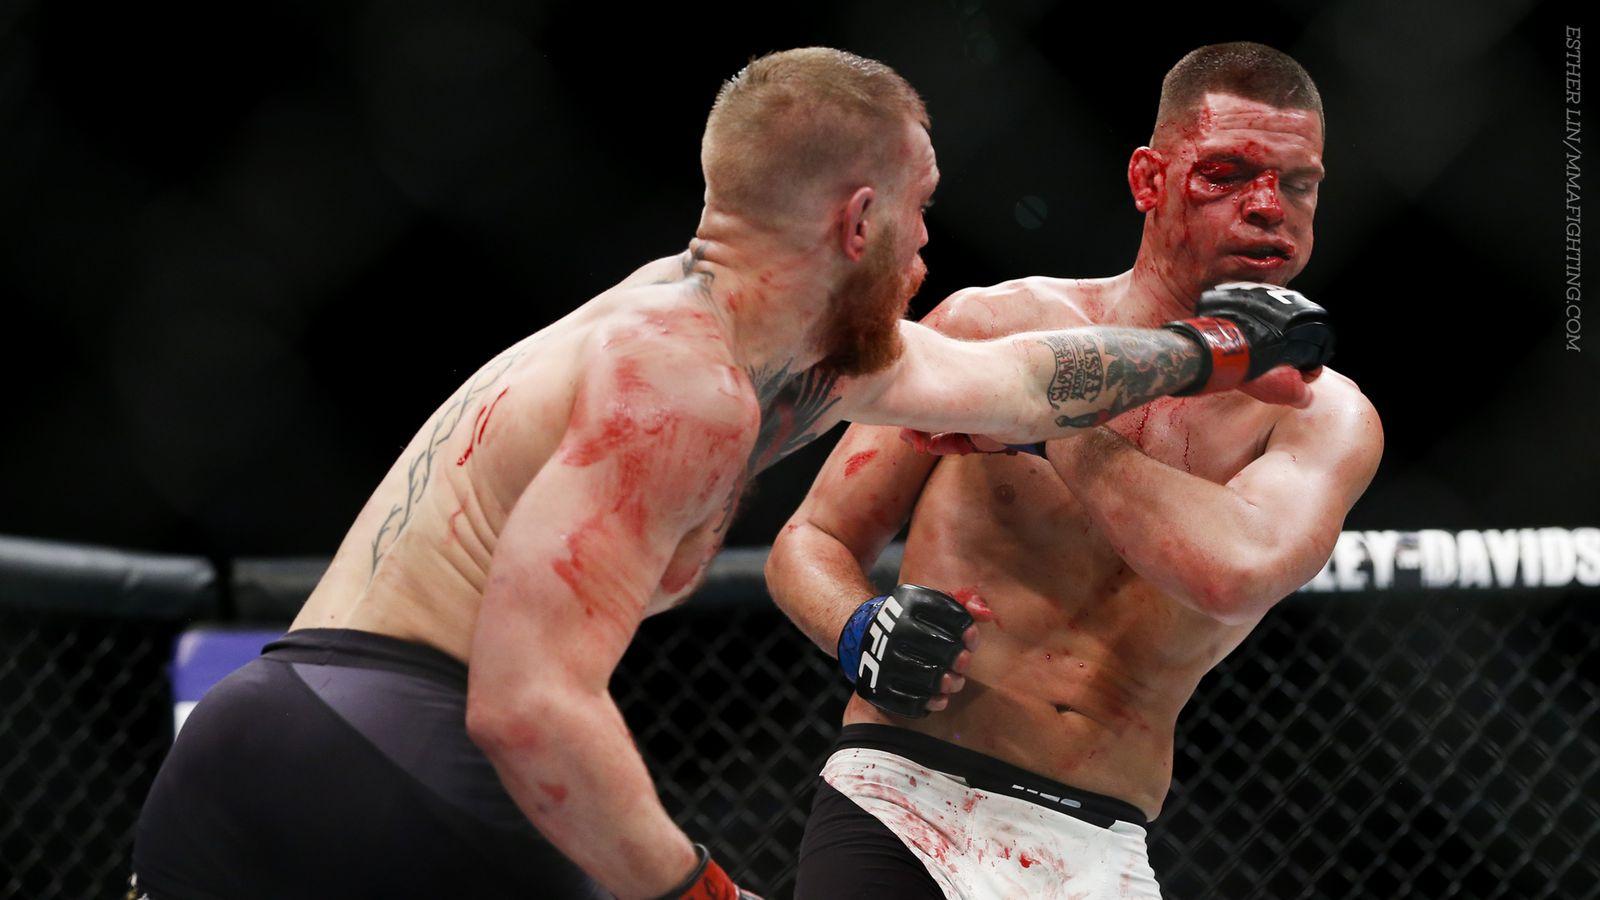 conor mcgregor vs nate diaz full fight